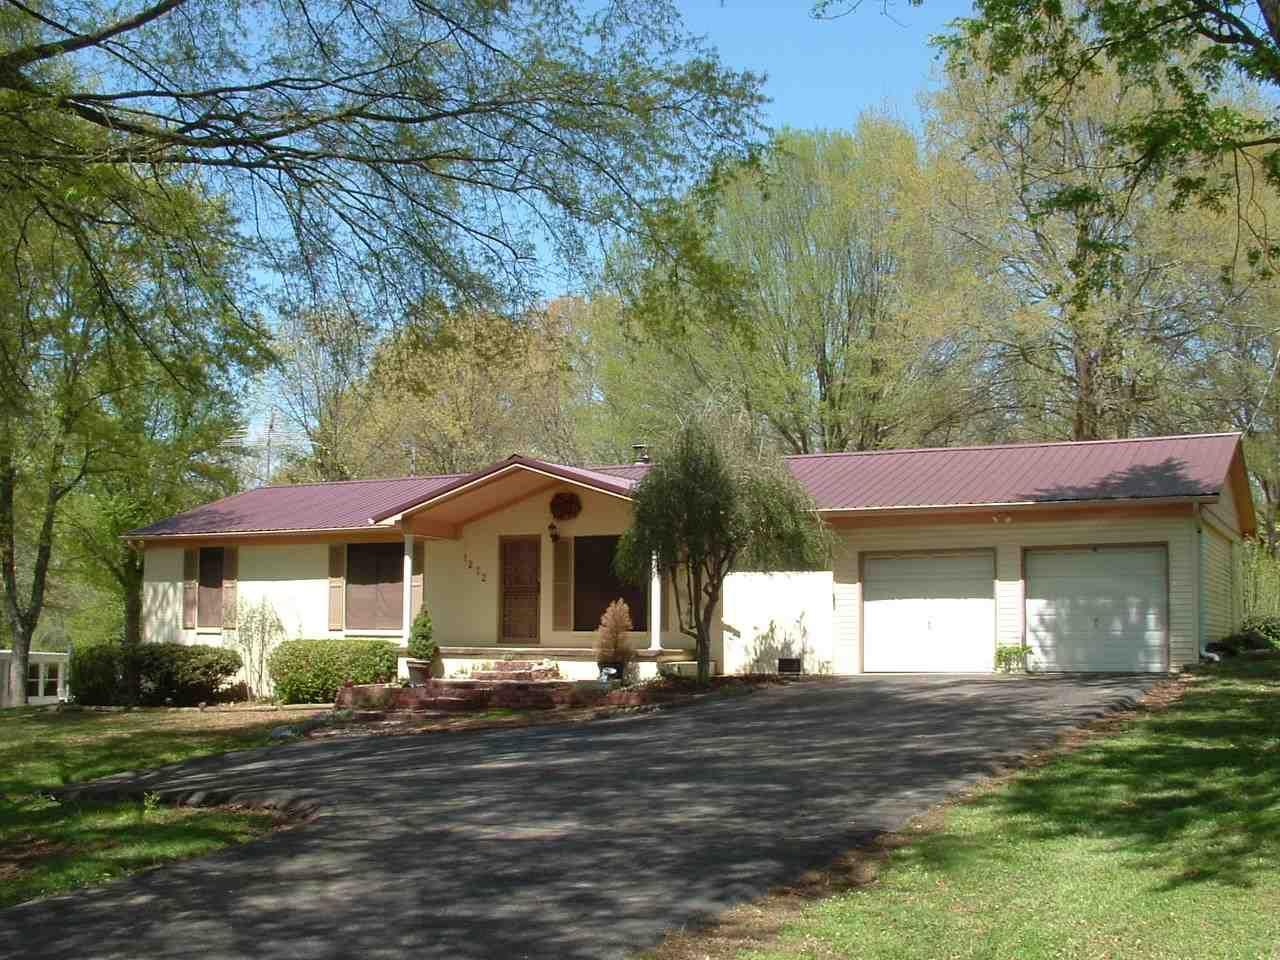 112000 trenton tn gibson county house styles